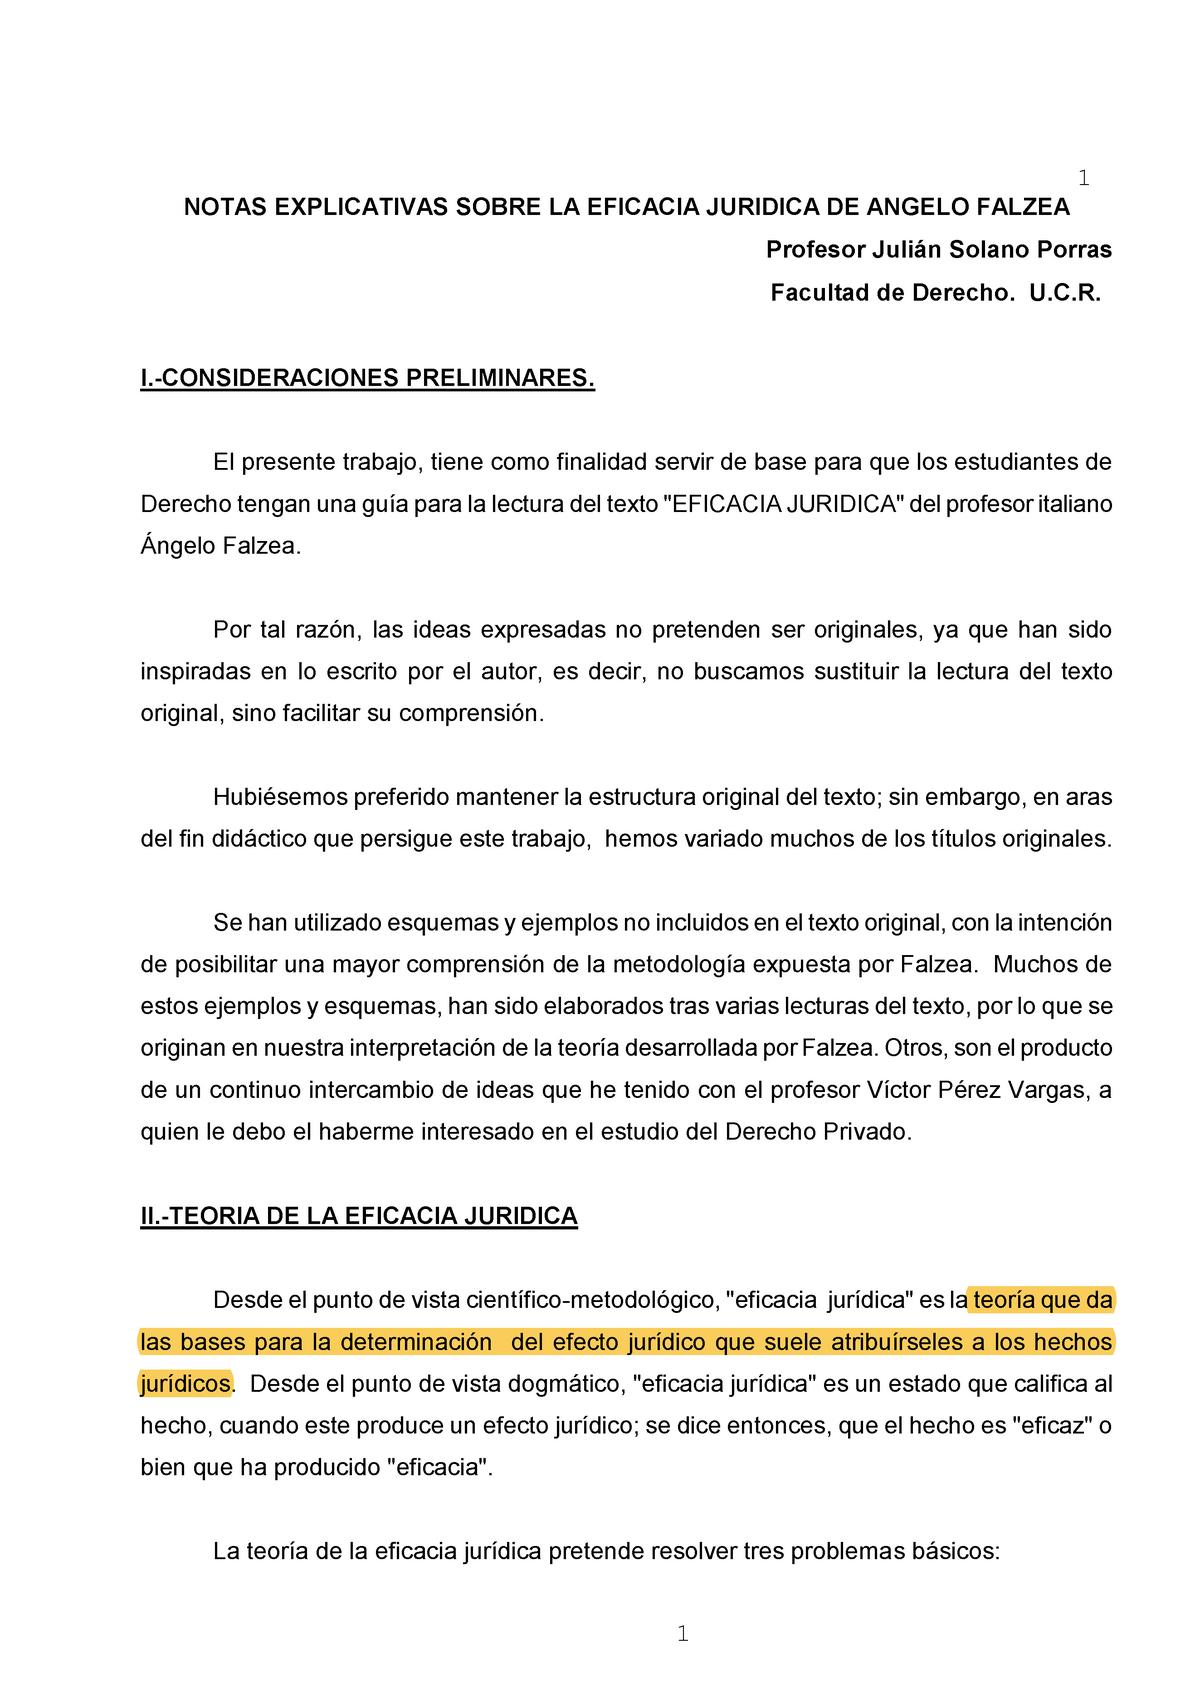 Resumen Eficacia Jurídica De2001 Ucr Studocu